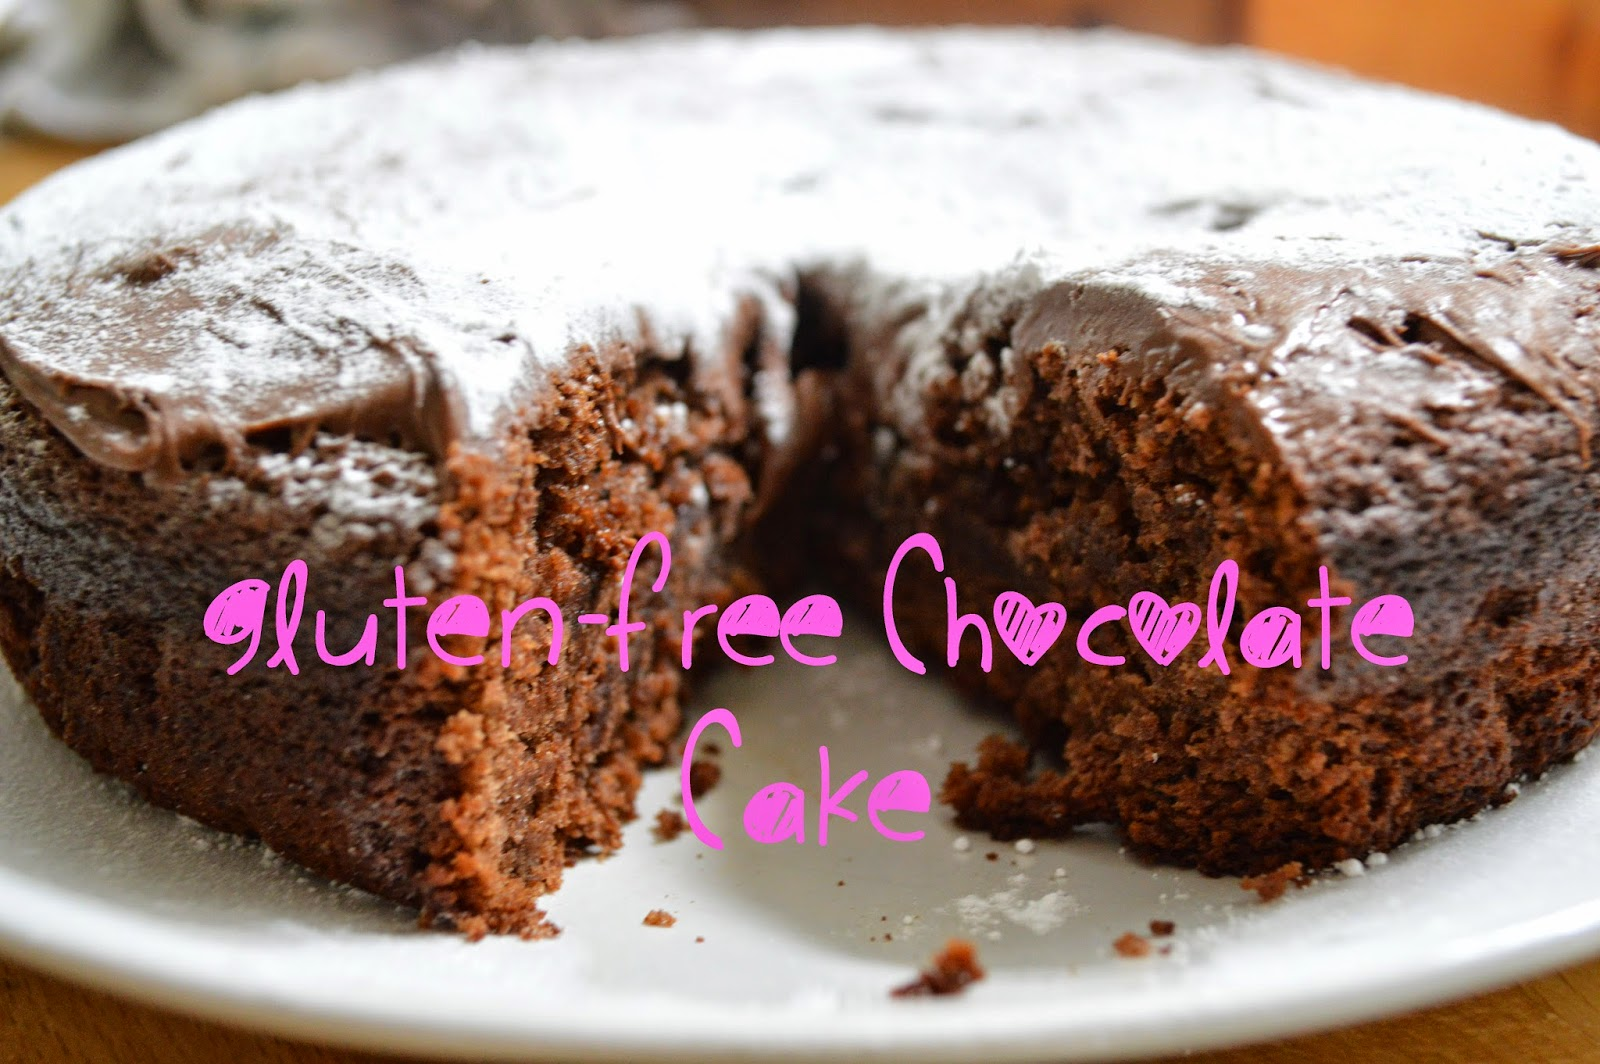 simple, gluten-free chocolate cake, grams, UK, recipe, home baking, elderflower, tasty, delicious